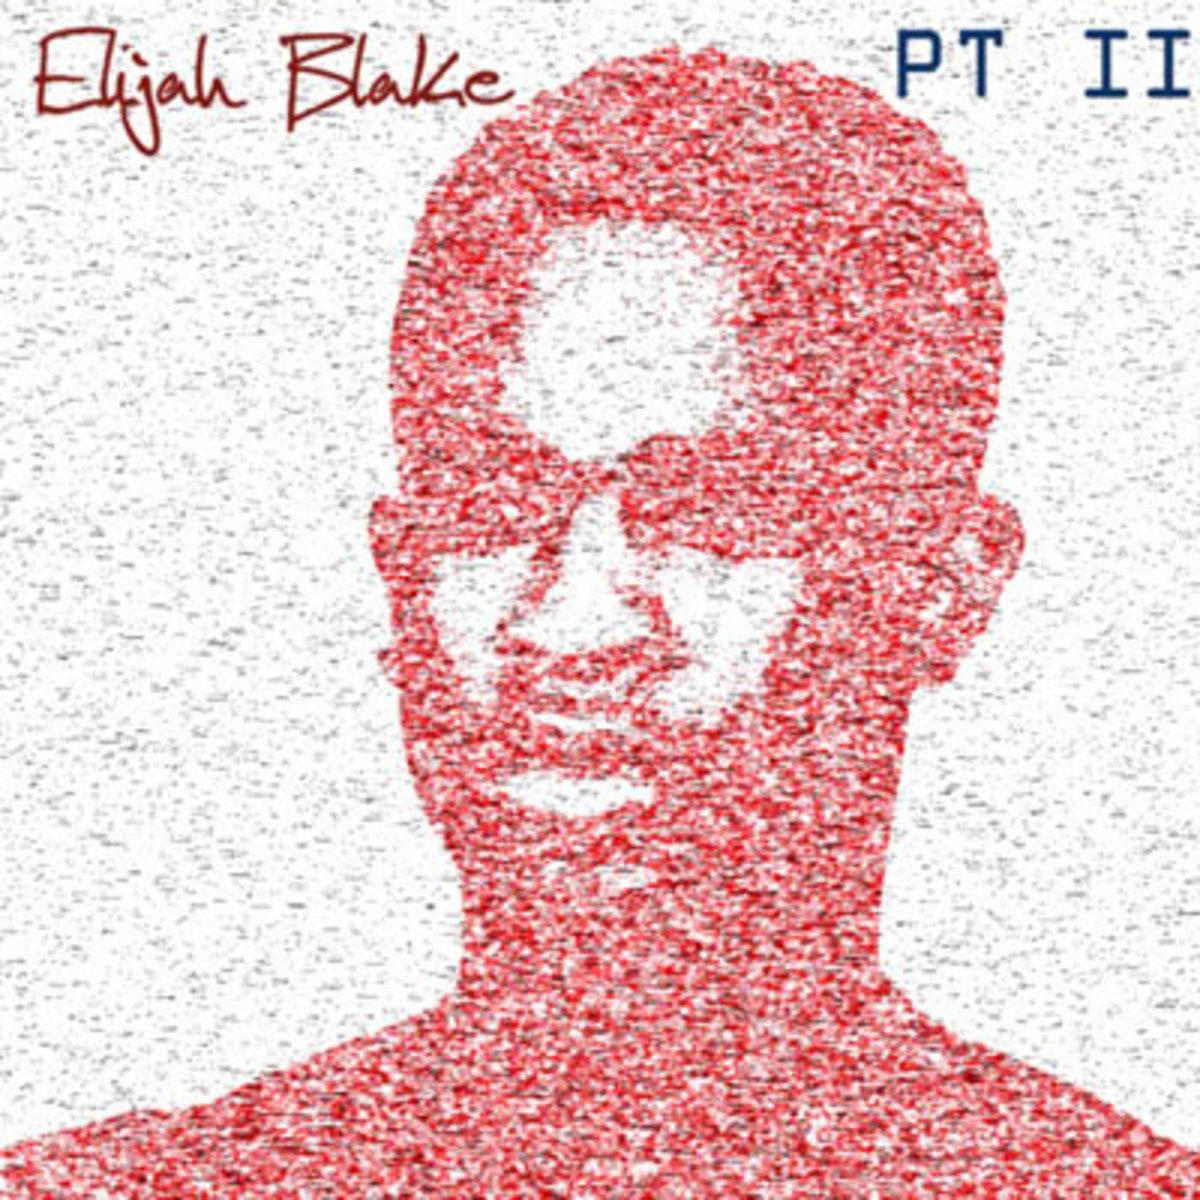 elijahblake-freept2.jpg